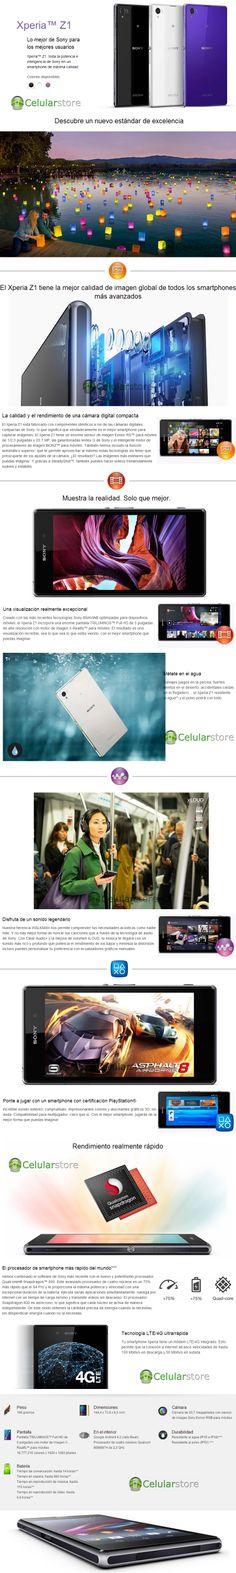 comprar sony xperia z1 / venta de sony xperia z1 en argentina Sony Xperia, Android, Shopping, Argentina, Buenos Aires, Display